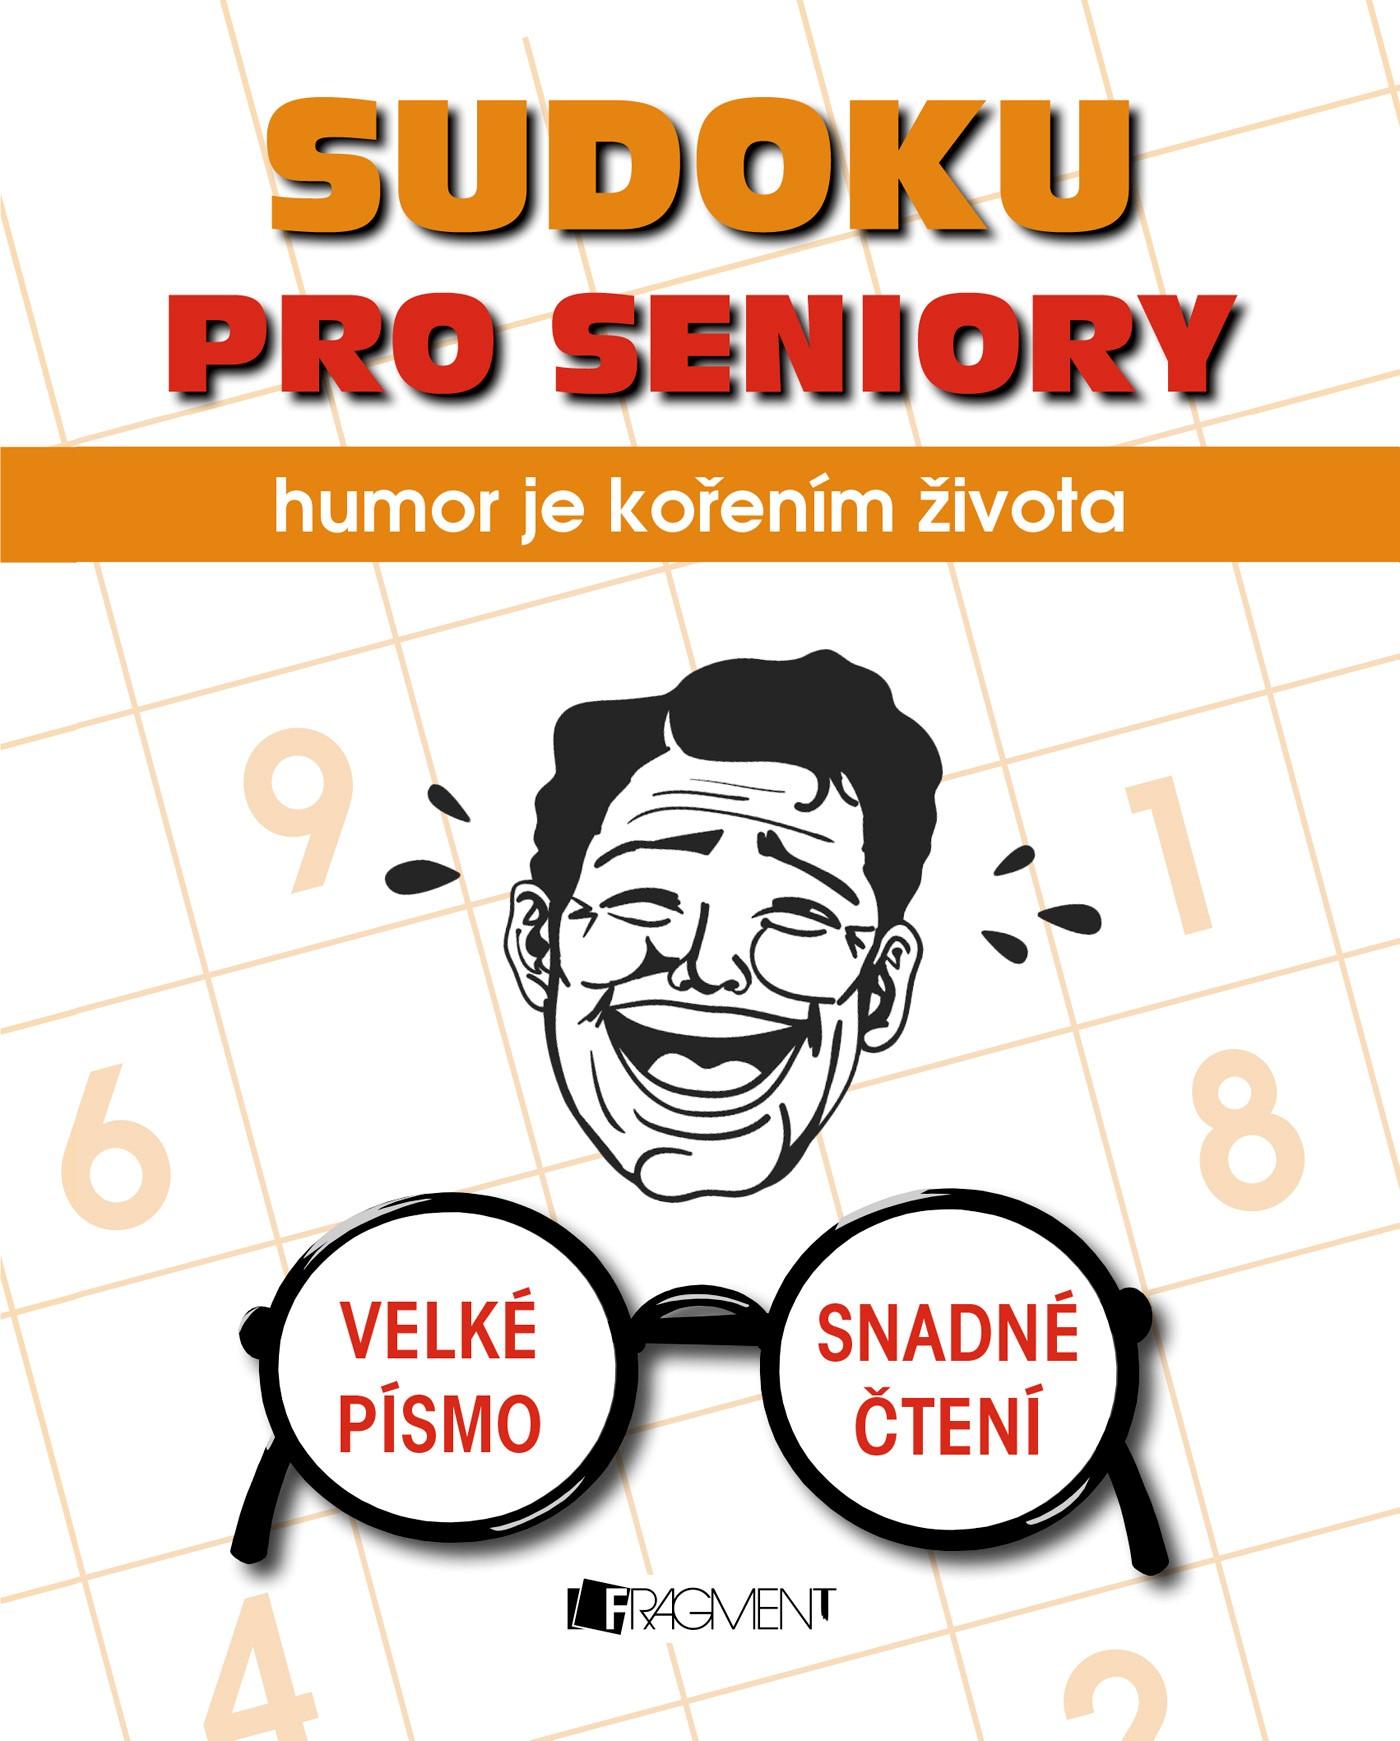 Sudoku pro seniory – humor je kořením života